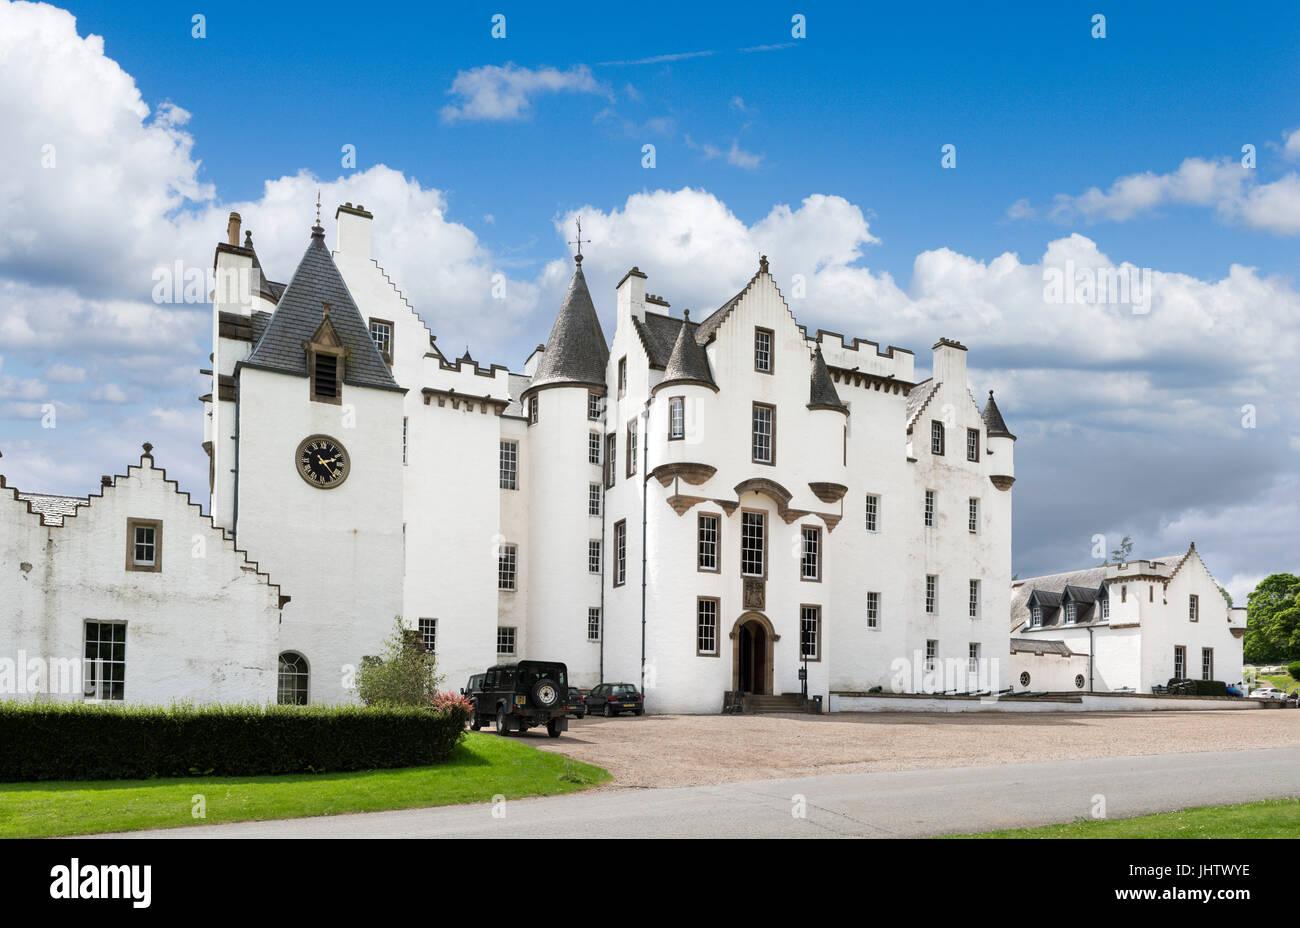 Blair Castle, Blair Atholl, Glen Garry, Perthshire, Scotland, UK - Stock Image